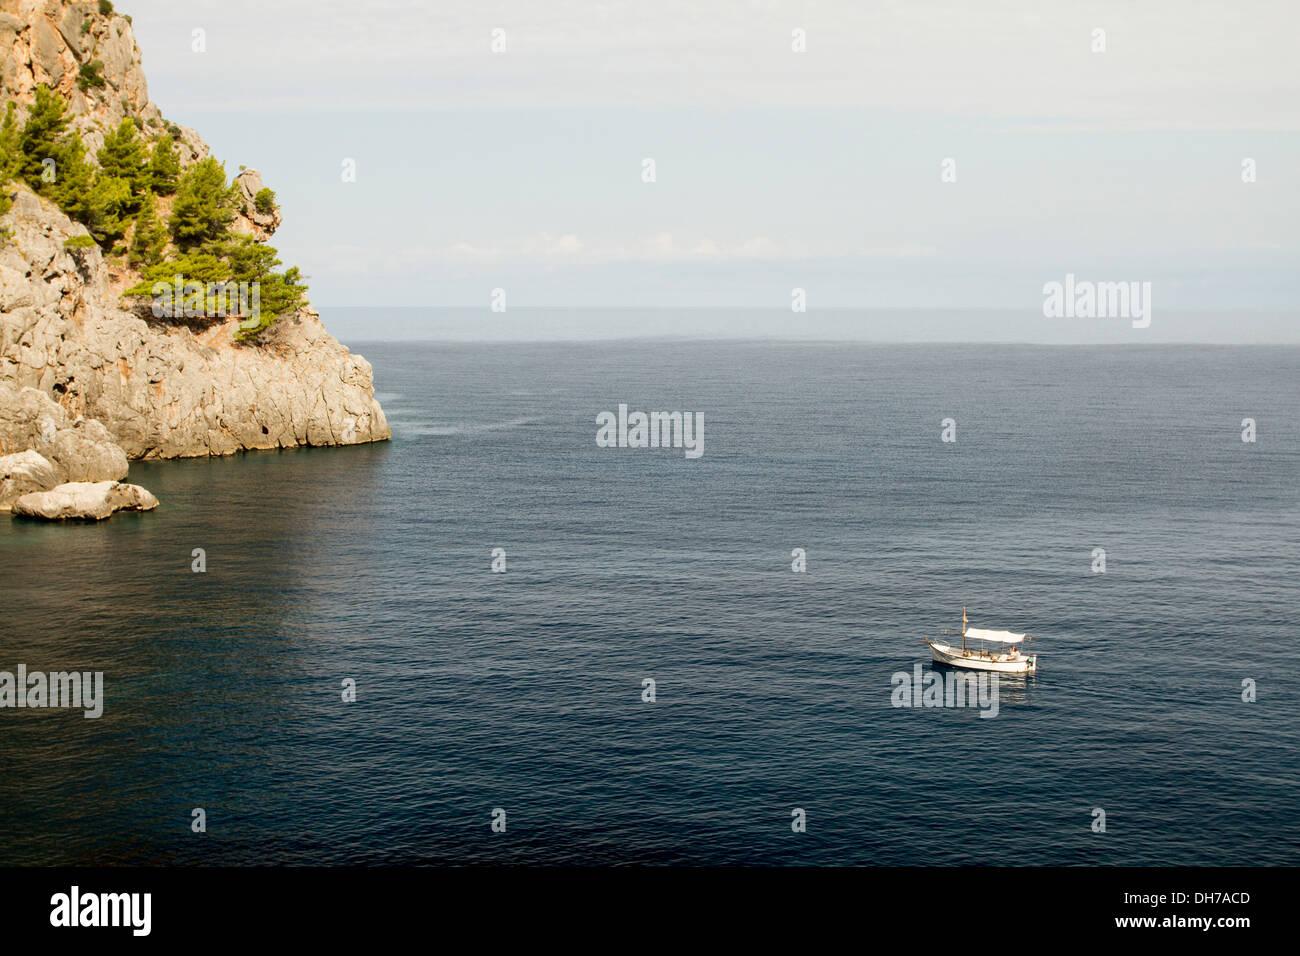 Sa Calobra, Mallorca. - Stock Image